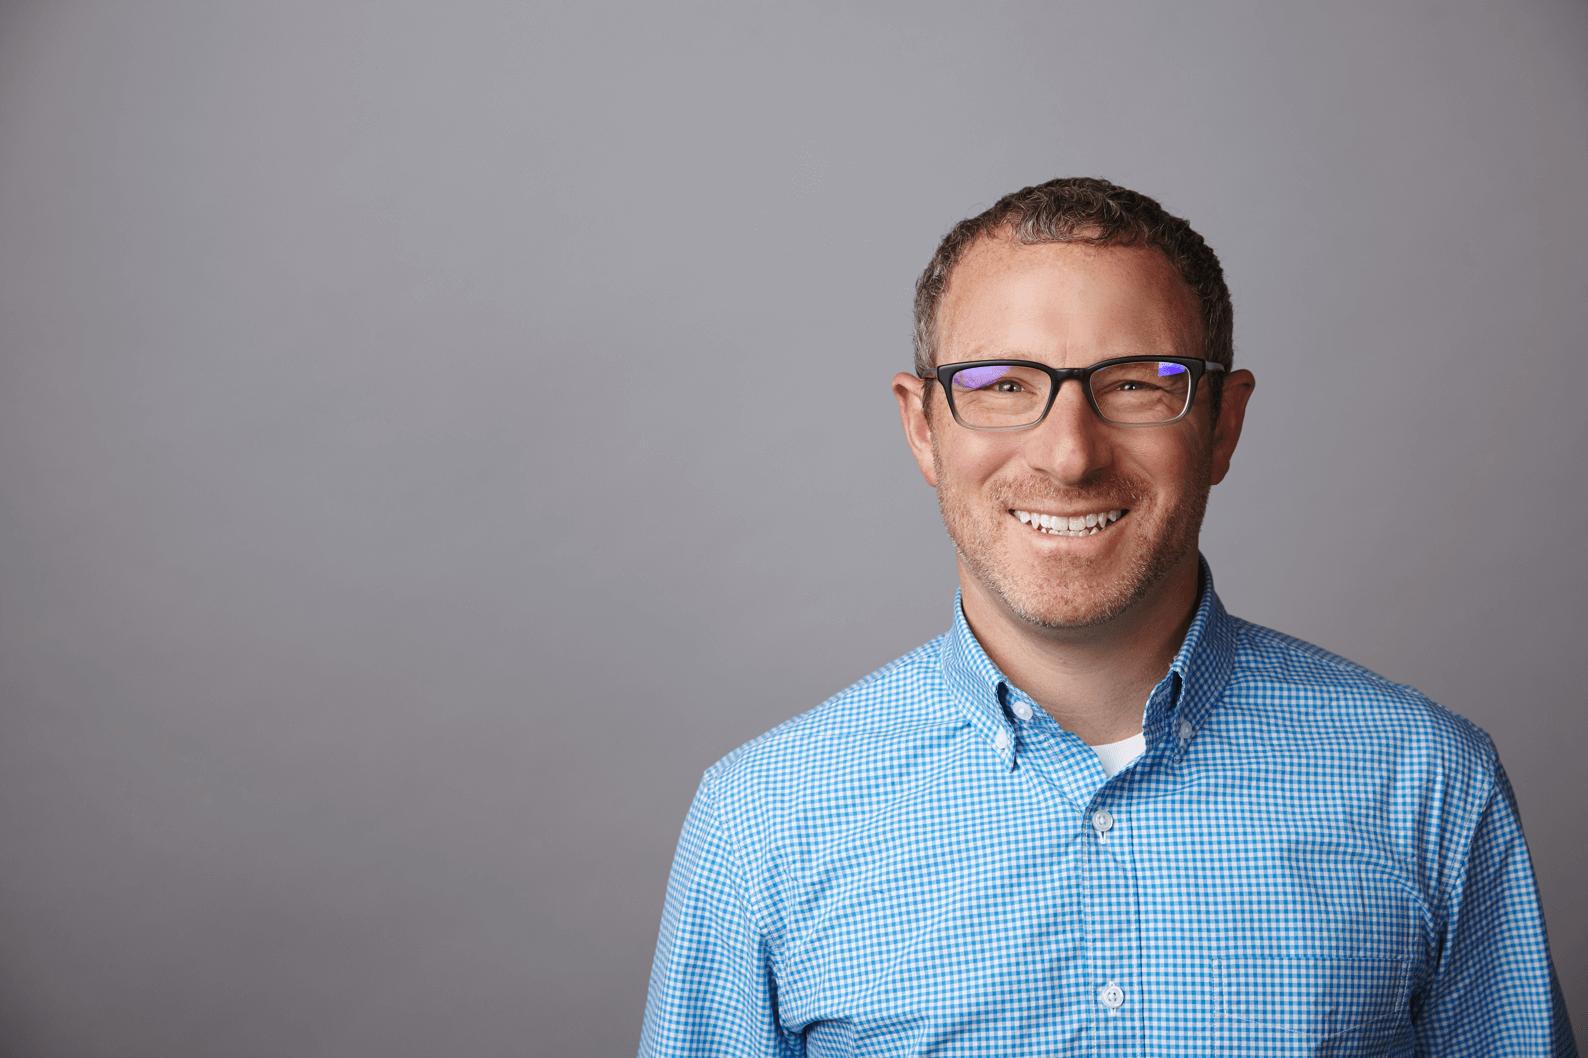 David Coffman, Controller at Doximity